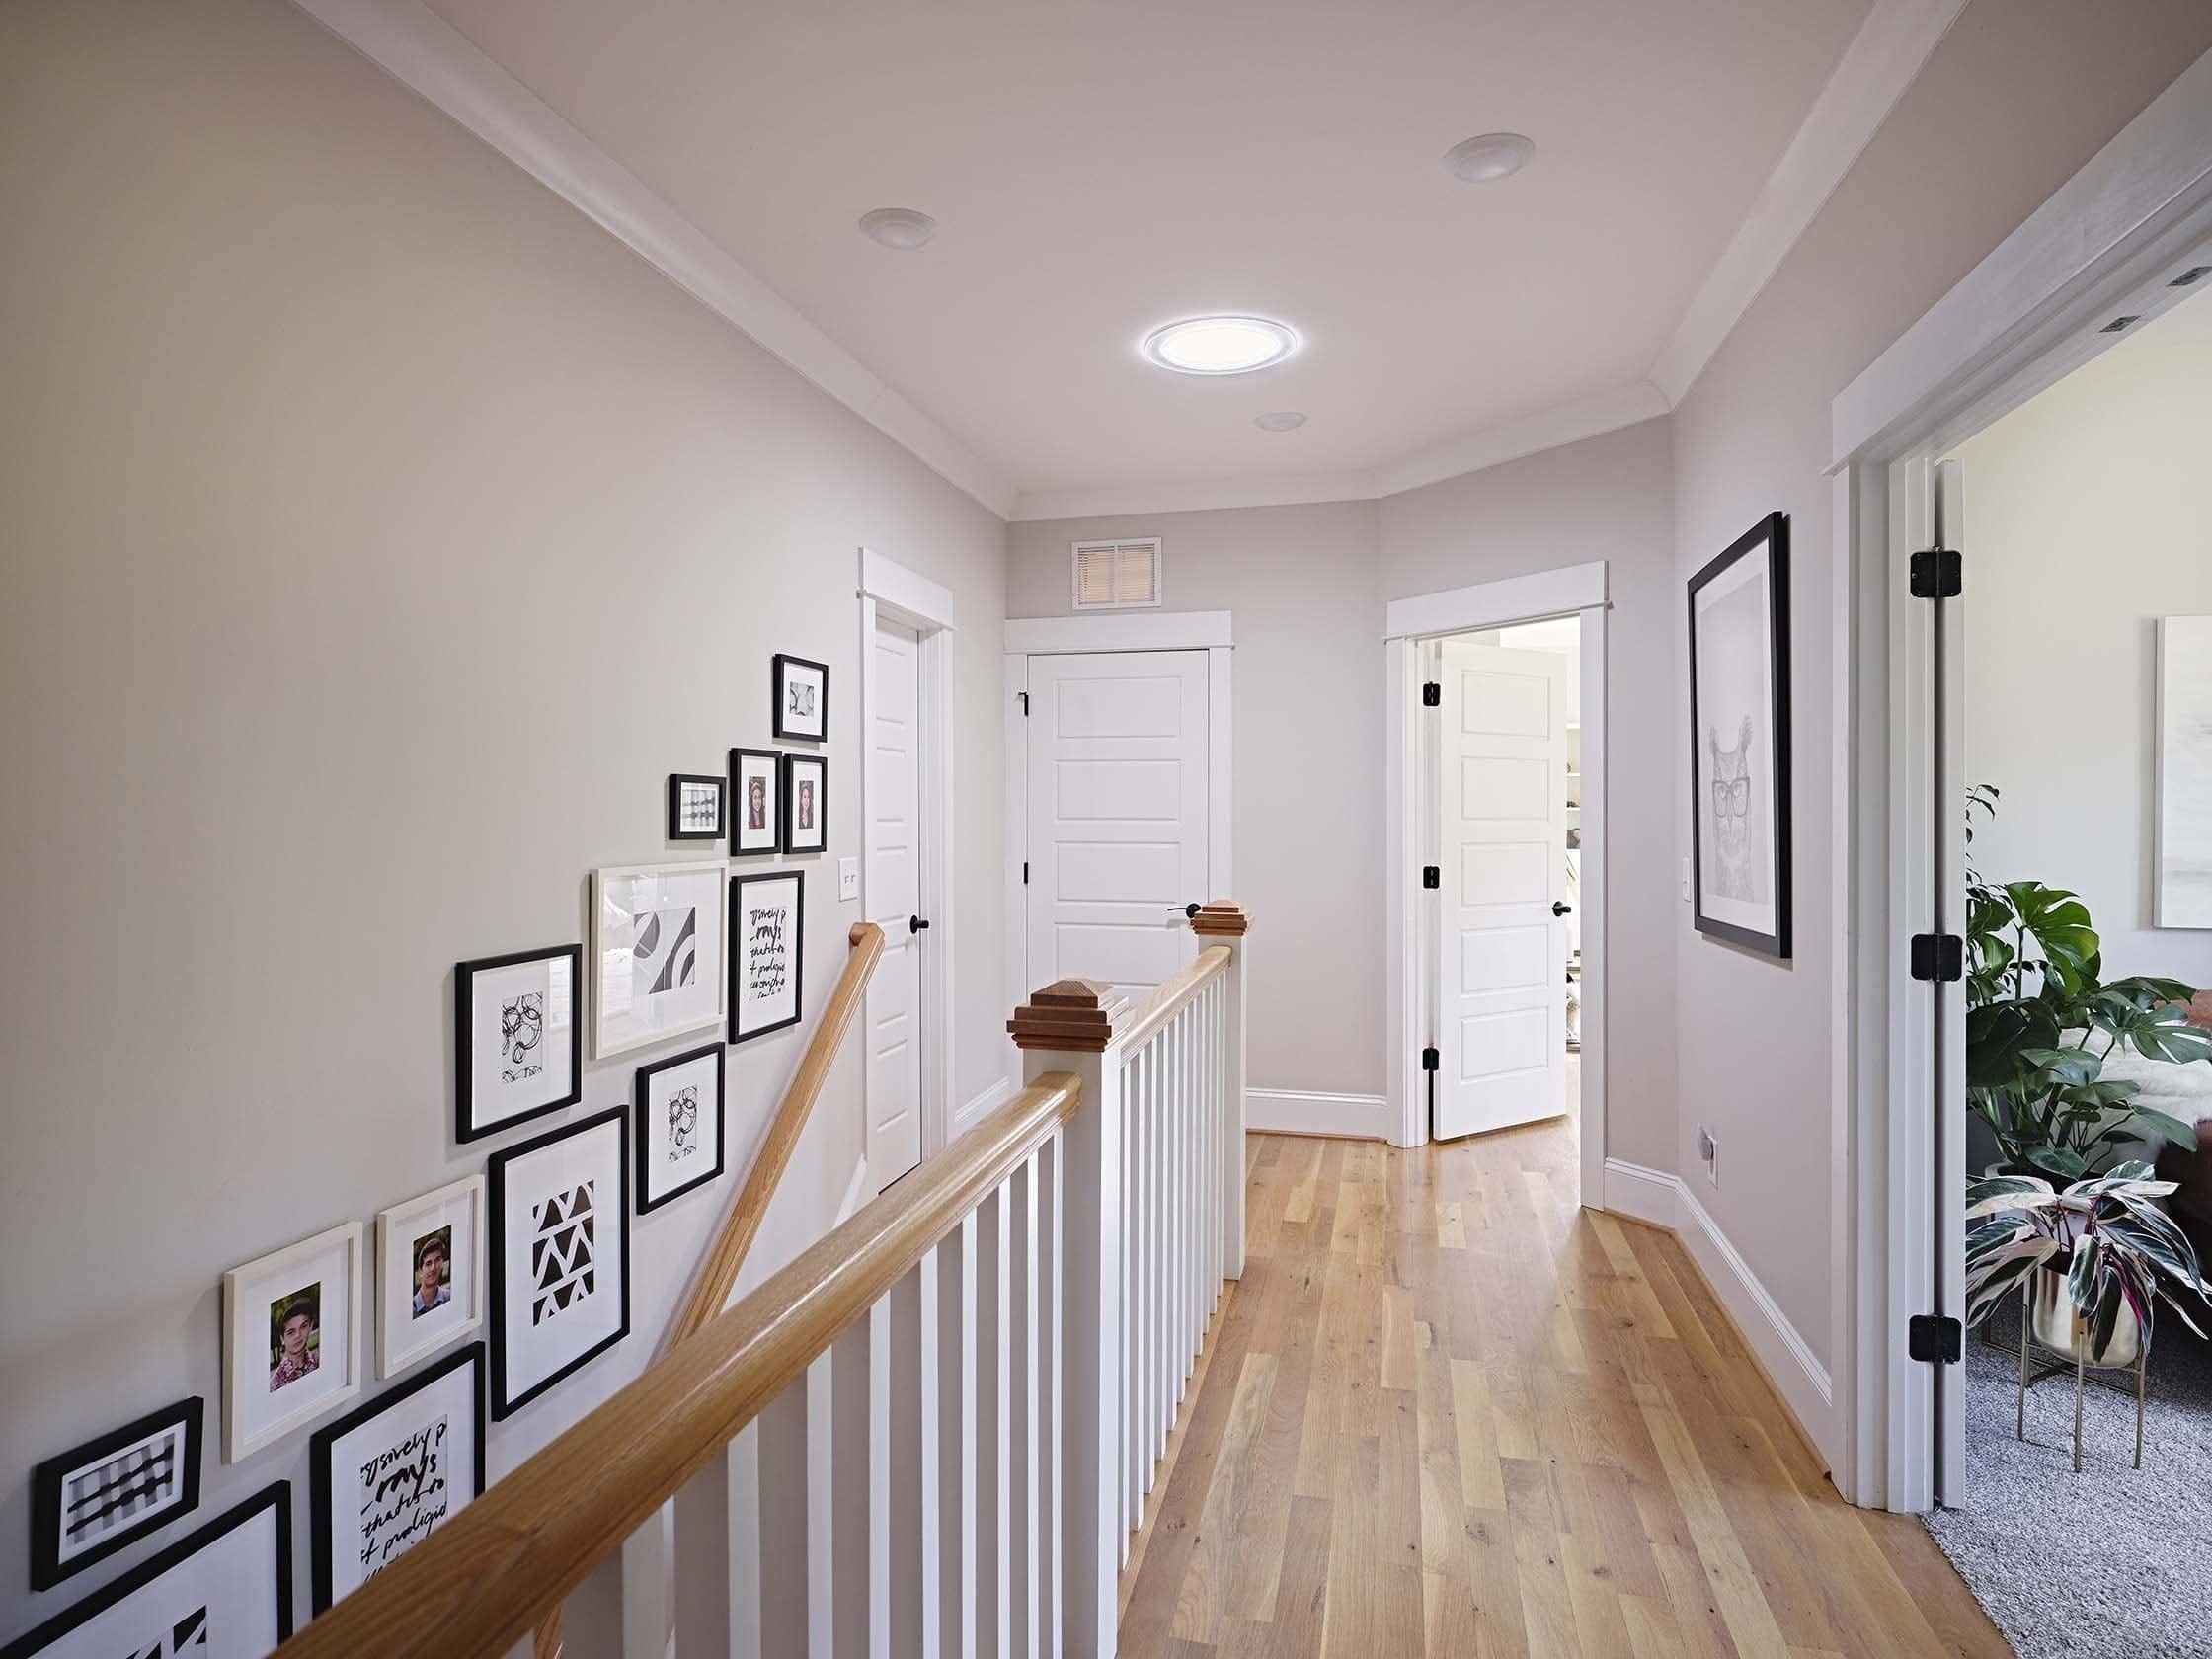 Sun Tunnel Stairwell art gallery